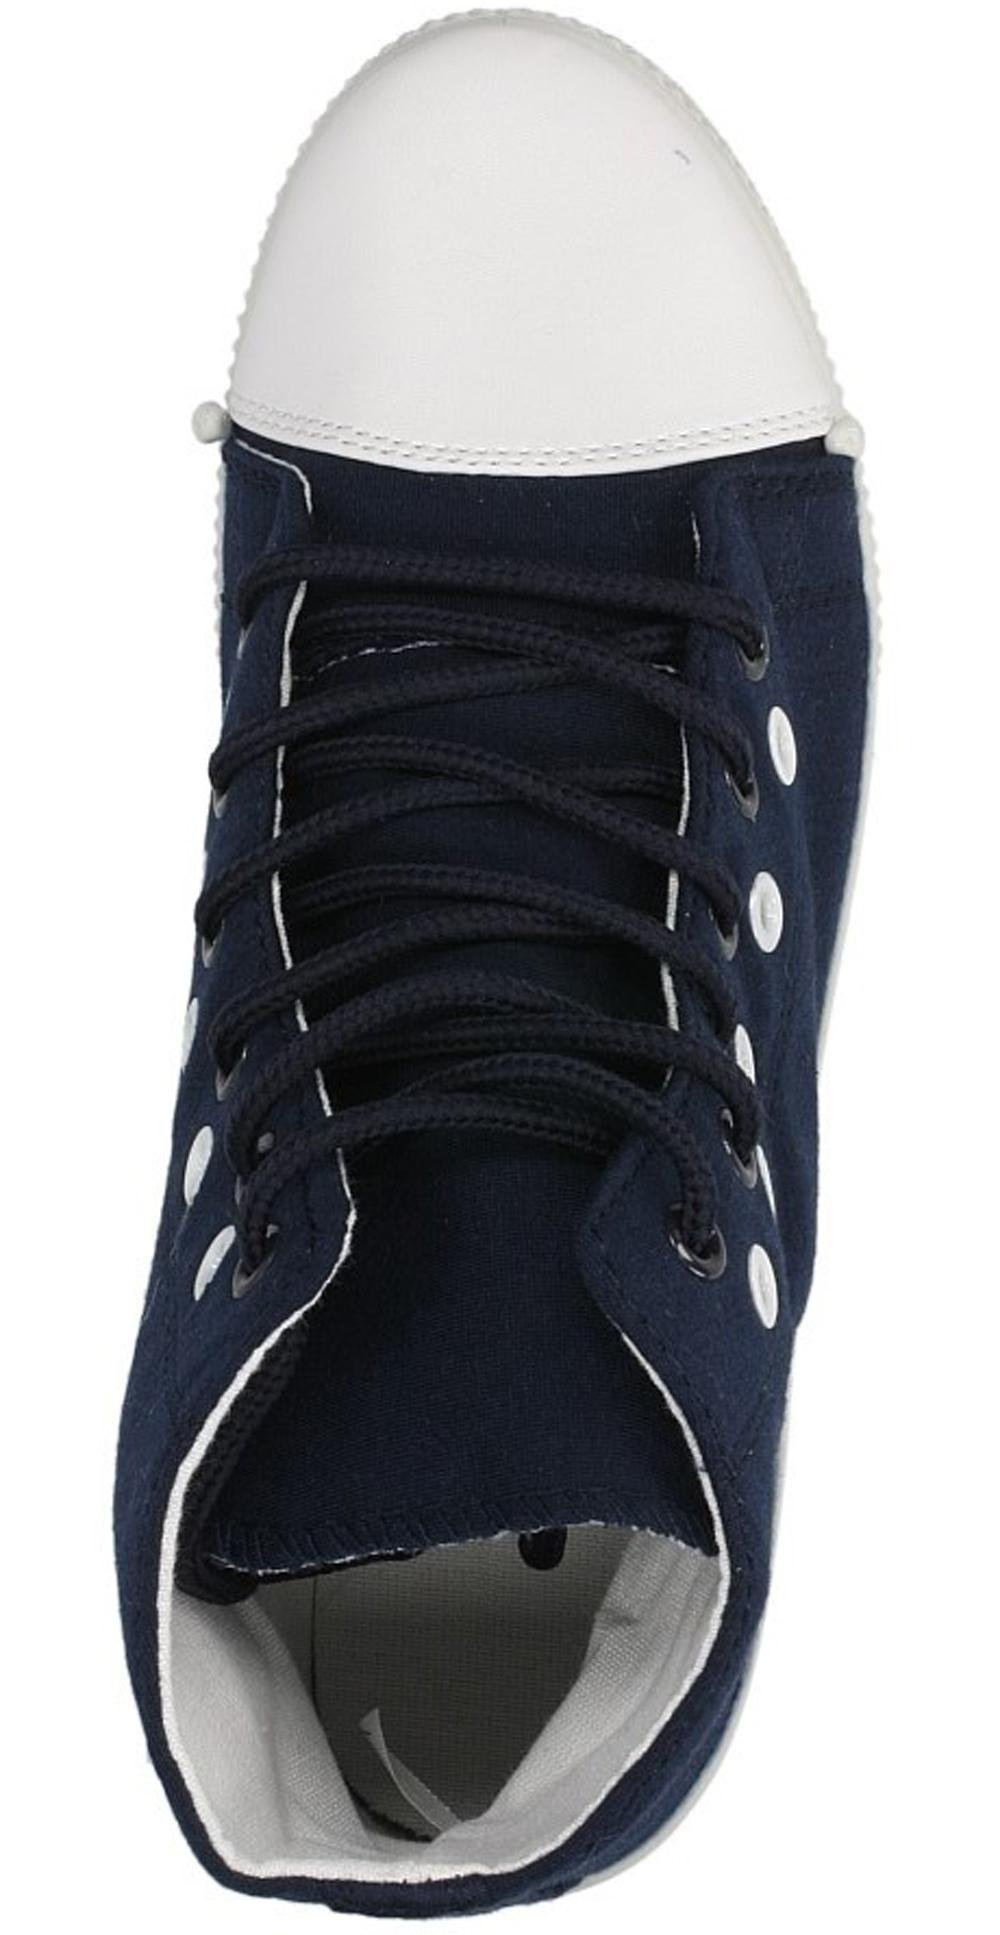 Damskie CREEPERSY CASU H201 niebieski;;